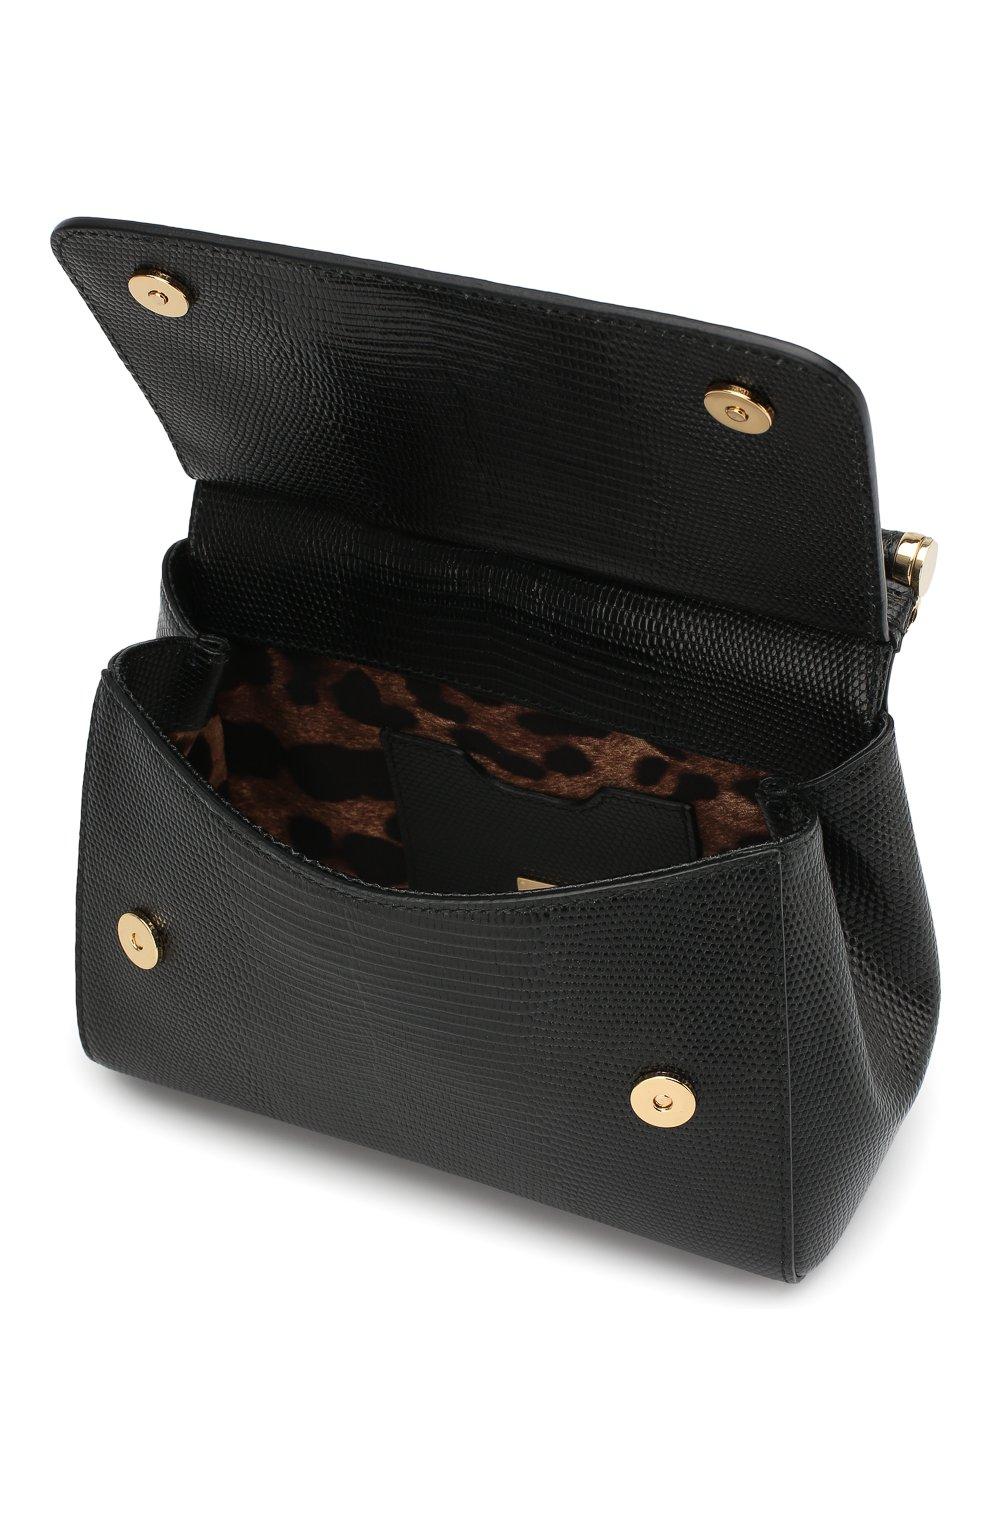 Сумка Sicily small на цепочке с бусинами Dolce & Gabbana черная цвета | Фото №4